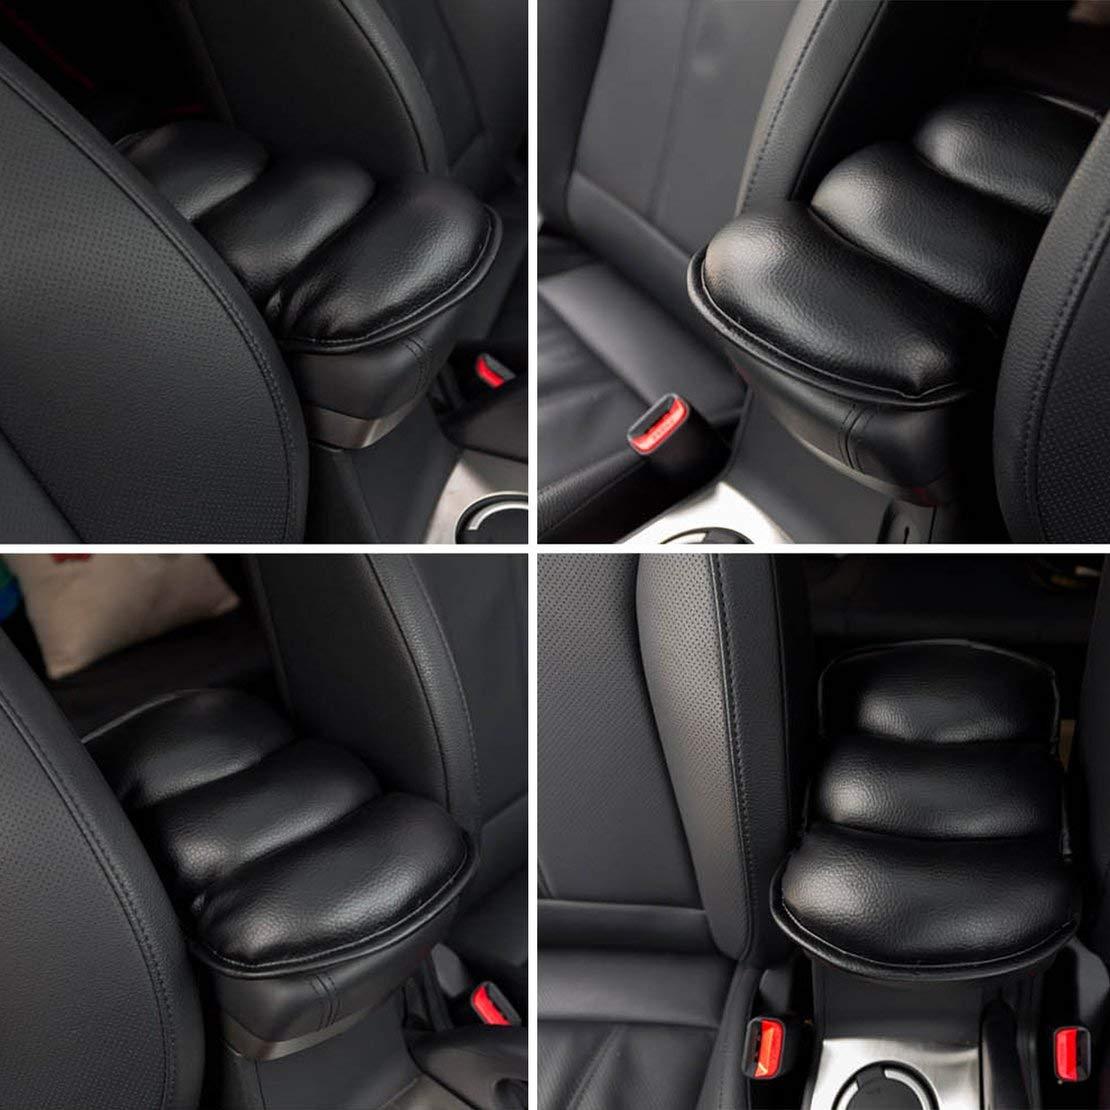 Sanzhileg Universal Super Soft PU Leather Auto Car apoyabrazos Pads Cubierta Color s/ólido veh/ículo Interior Estilo apoyabrazos Asiento Almohadilla Protectora